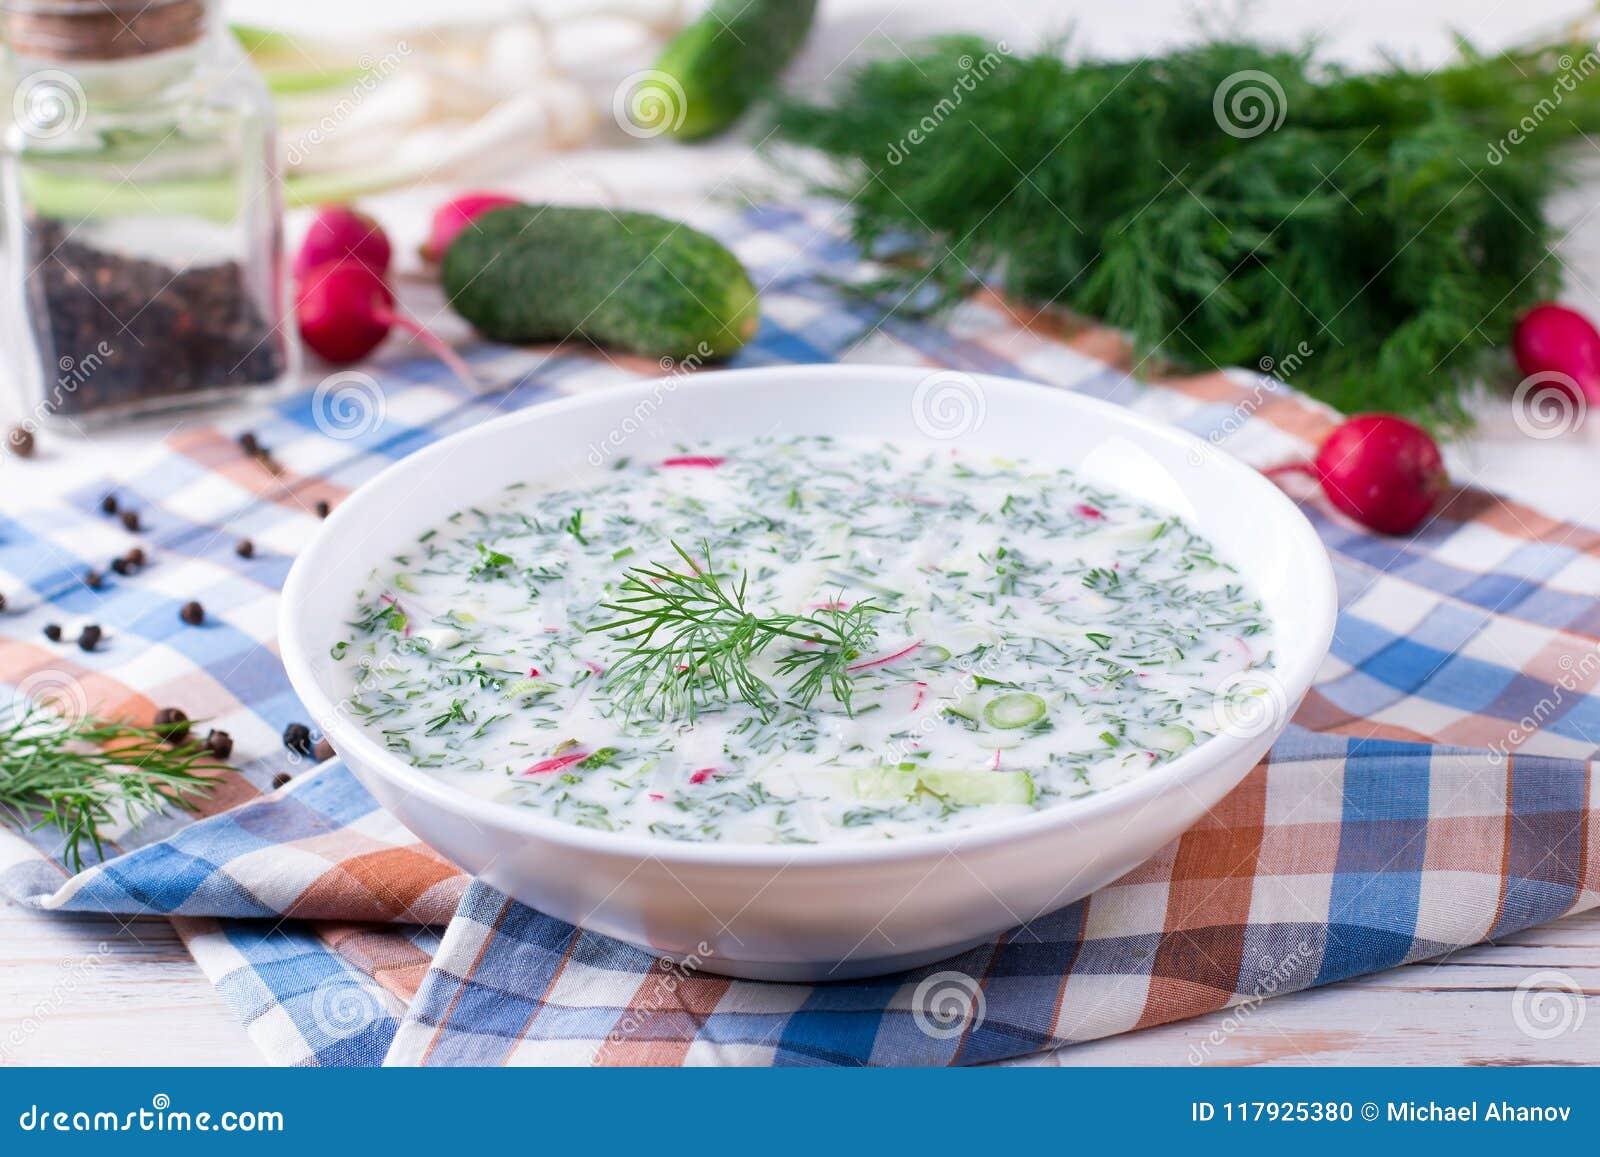 Okroshka. Summer light cold yogurt soup with cucumber, radish, eggs and dill on a table.